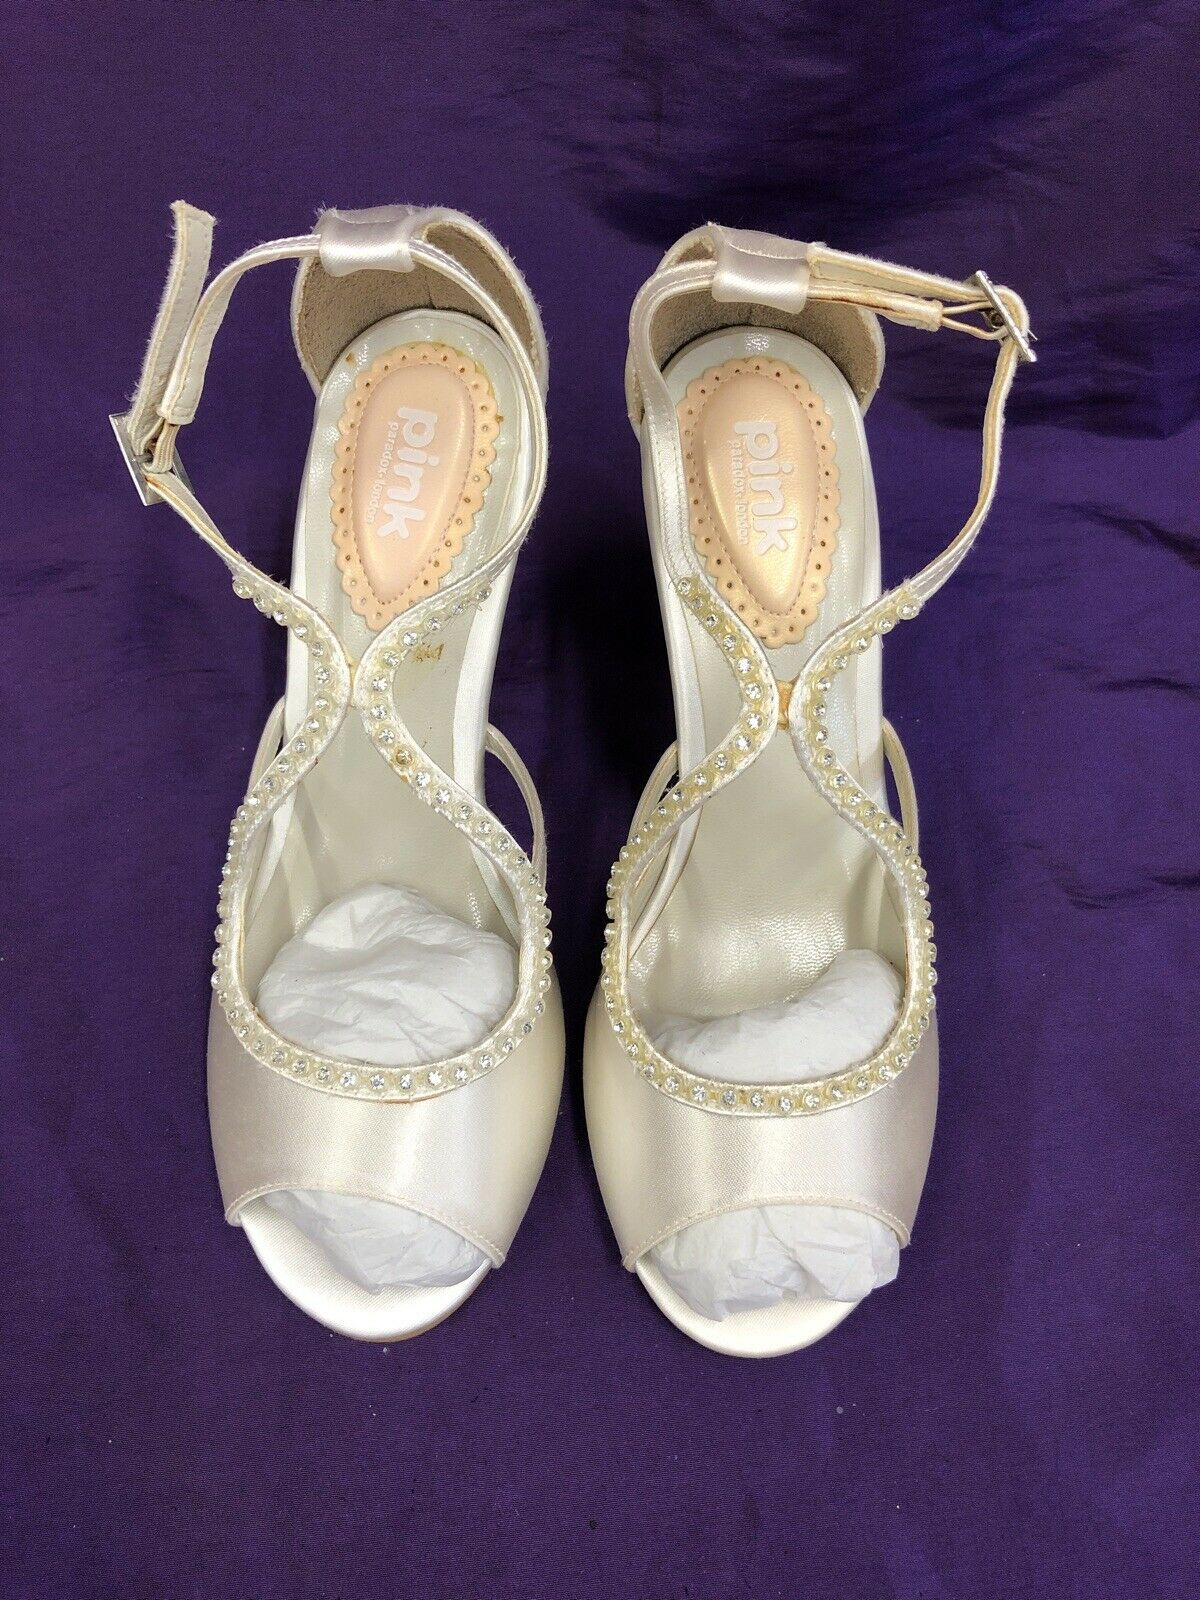 Pink Paradox Ivory Peep Toe Diamanté Satin Heels UK size 3 - Wedding Occasion